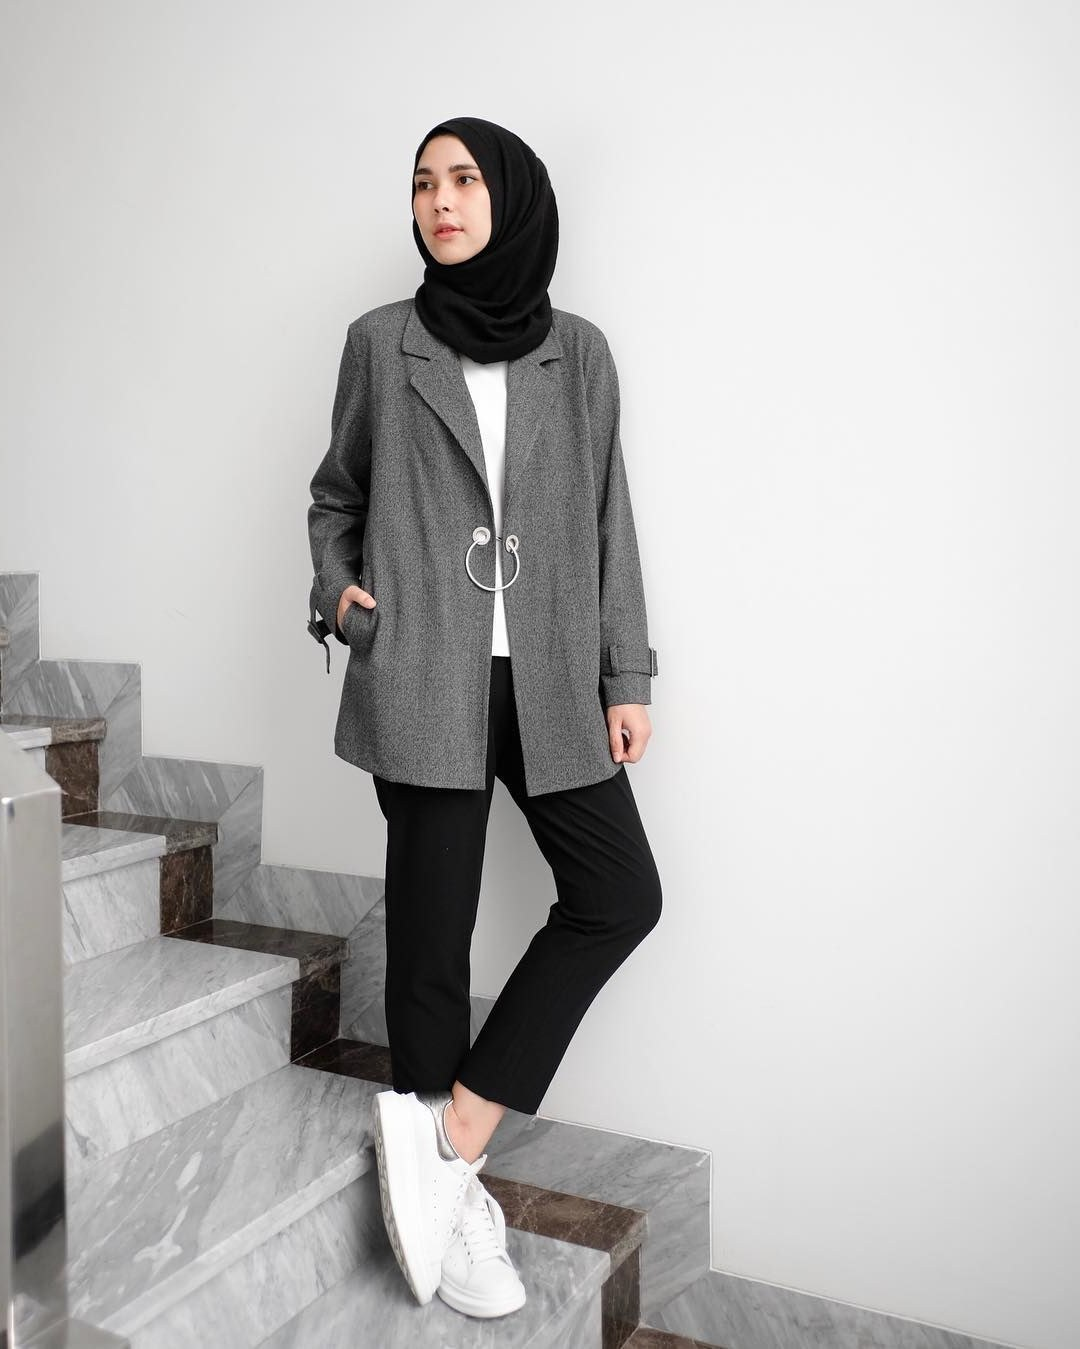 Model Fashion Muslimah Casual 0gdr 2 475 Likes 16 Ments Rani Hatta Ranihatta On